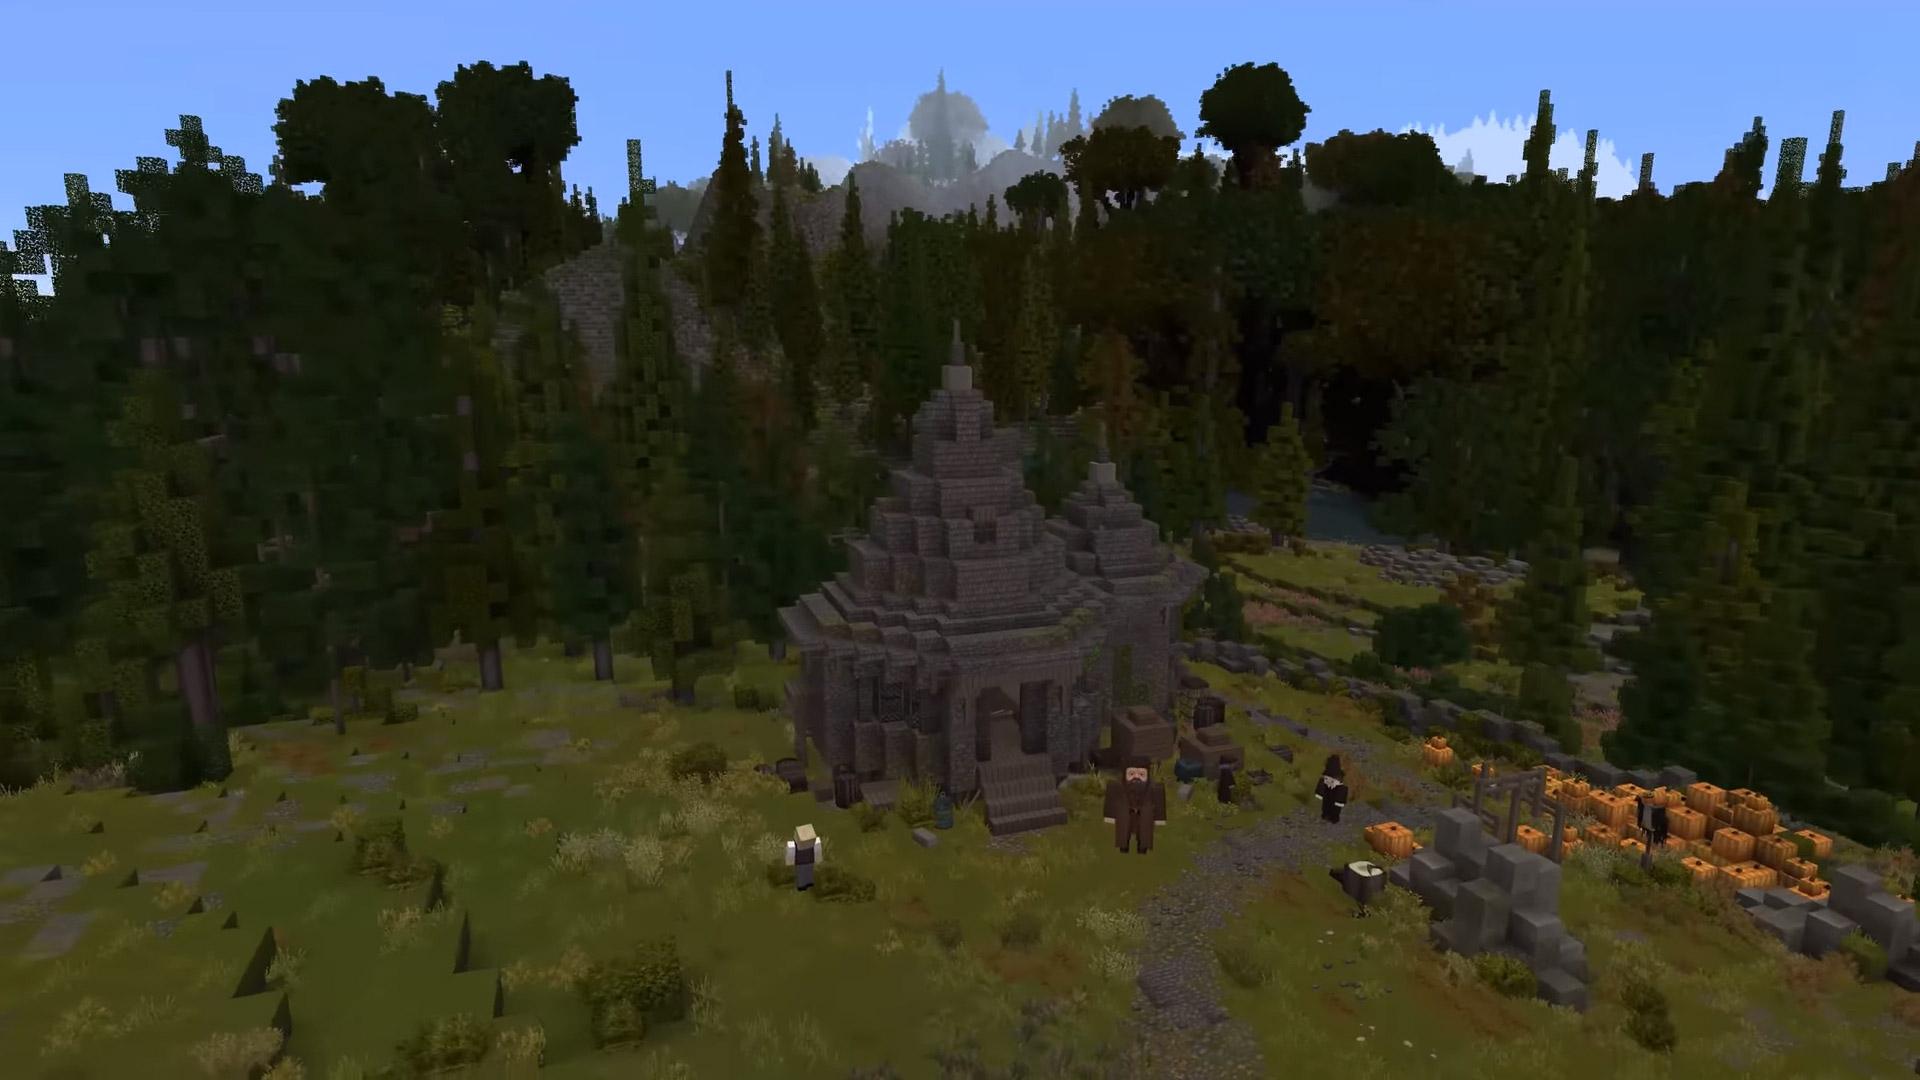 Minecraft meets Harry Potter in this heartfelt RPG map screenshot